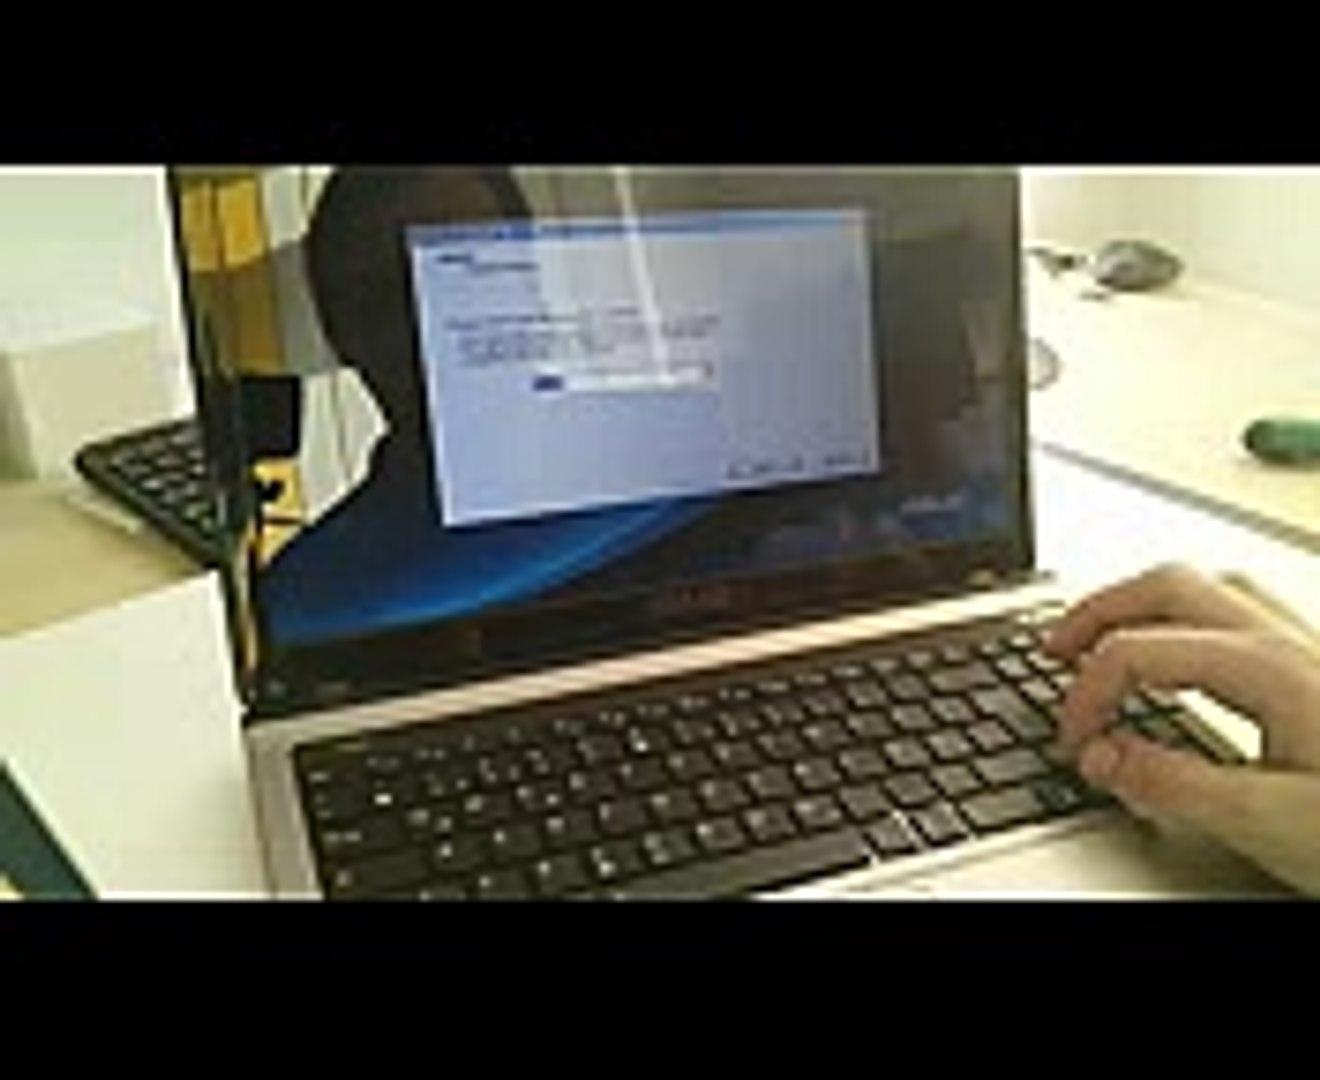 Asus Notebook Recovery  Wiederherstellung  Neuinstallation Auslieferzustand F9 (z.B.A53S K53S x53S